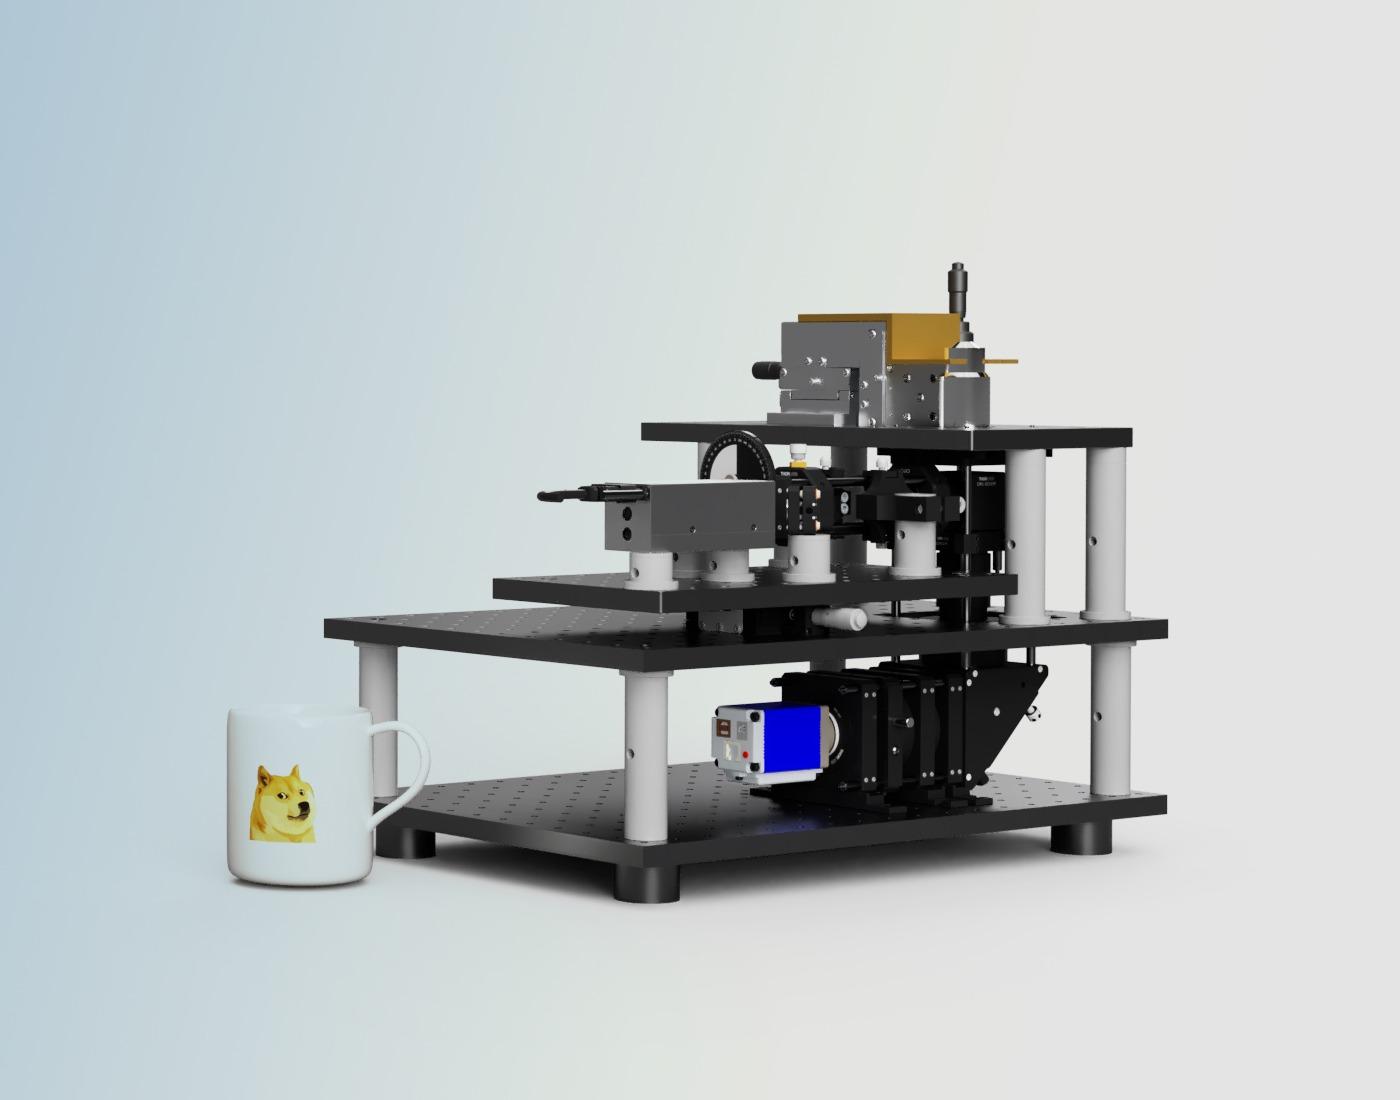 LiteTIRF Platform